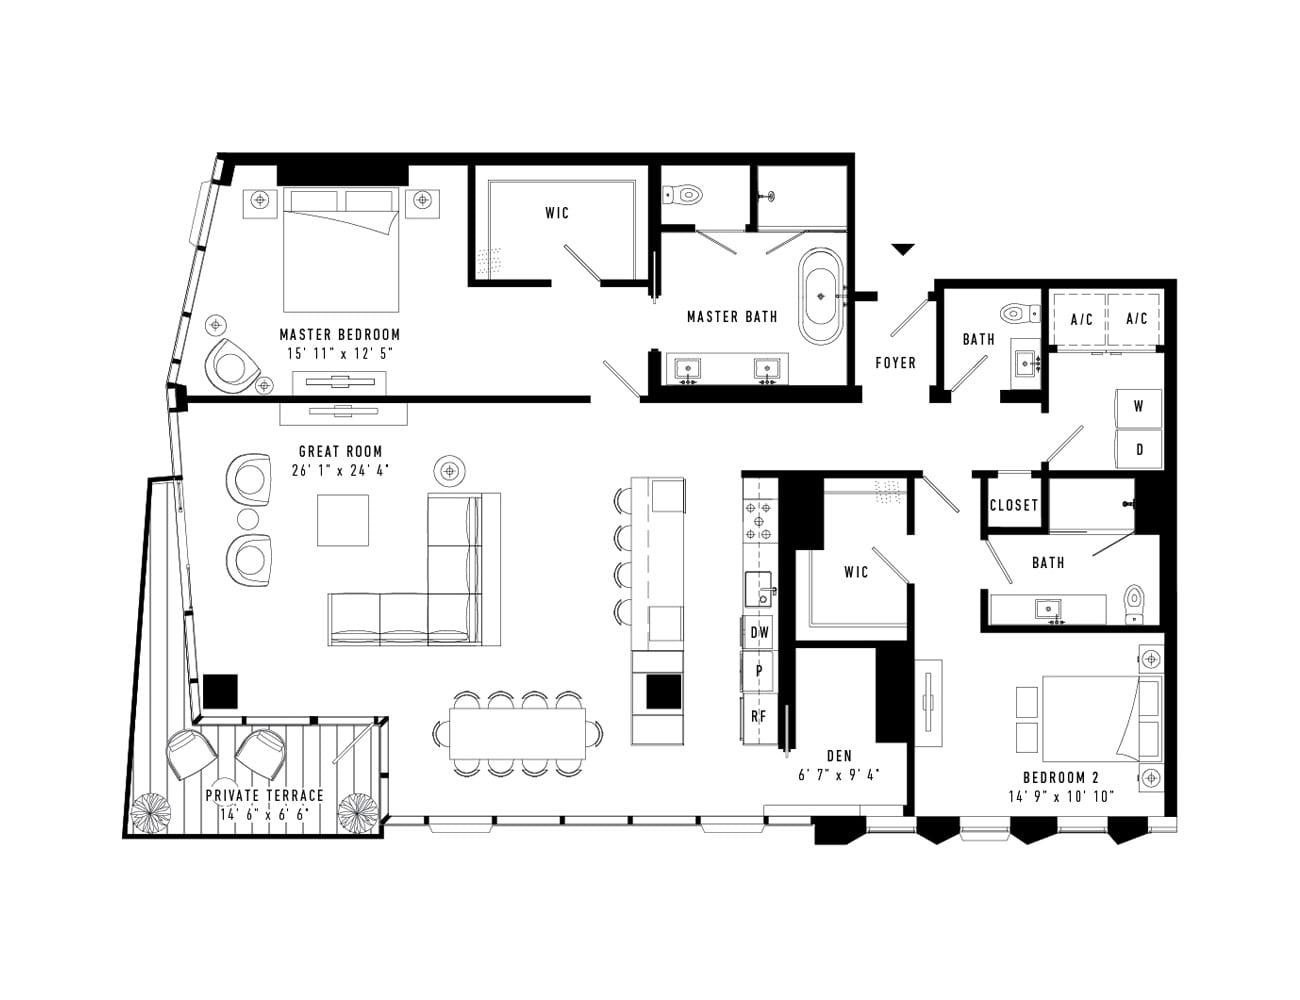 UNIT3A-Floorplan_111915 Image